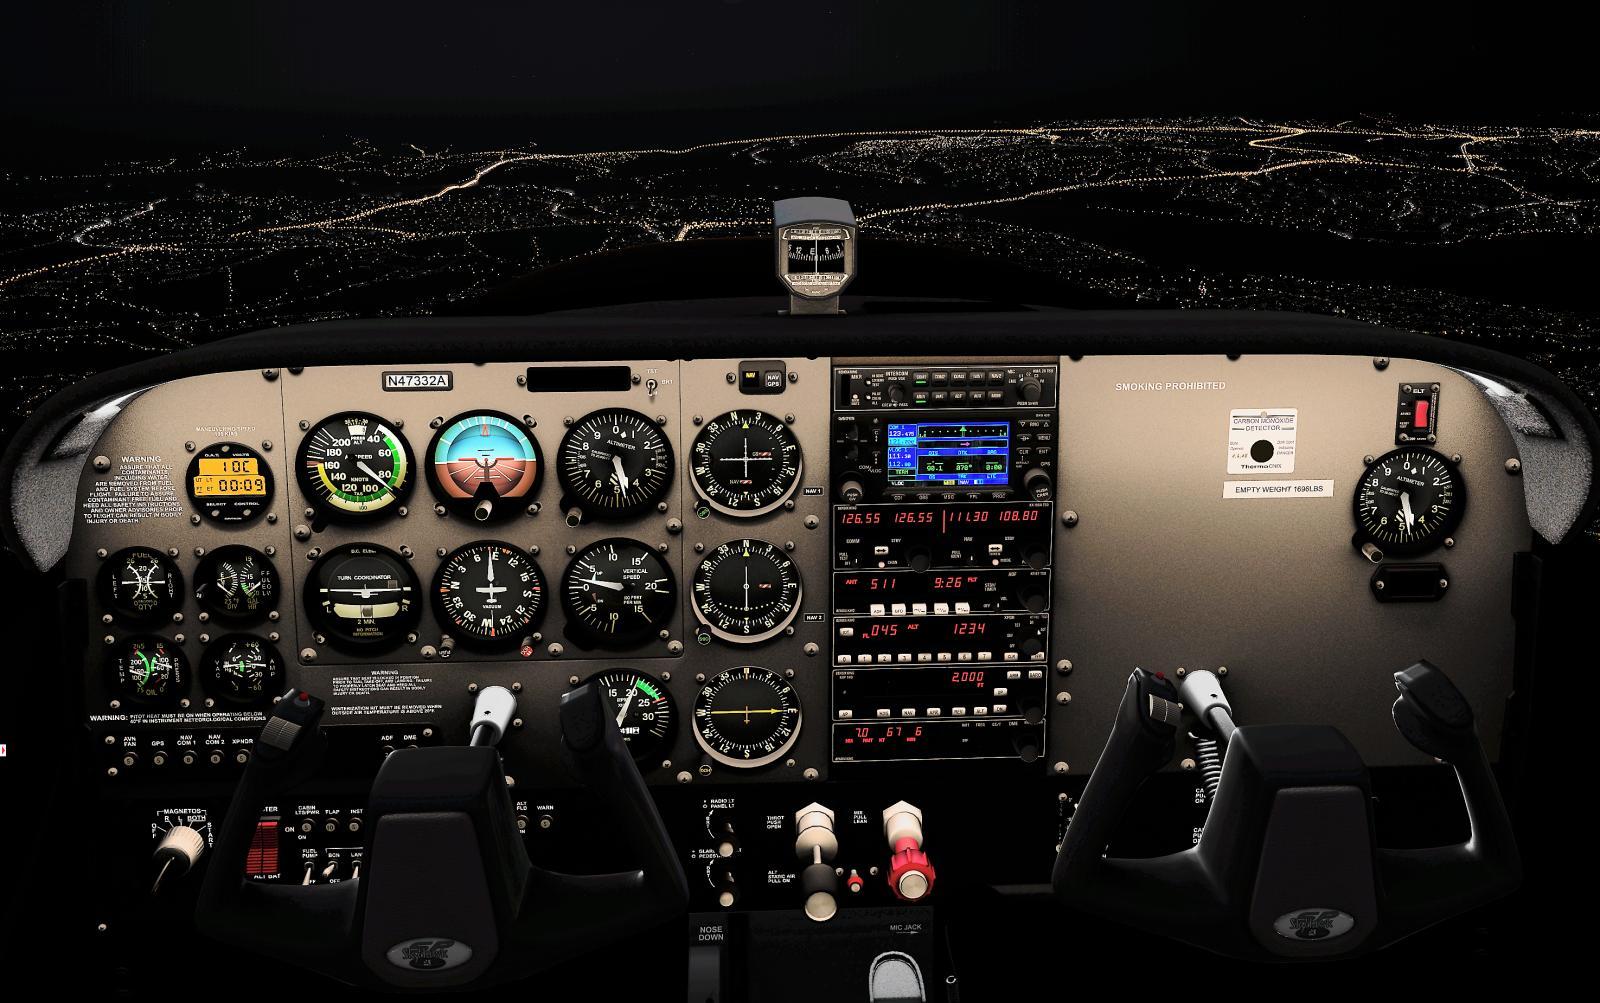 İsim:  Airfoillabs_C172SP_high_res_16.jpg Görüntüleme: 333 Büyüklük:  233.4 KB (Kilobyte)